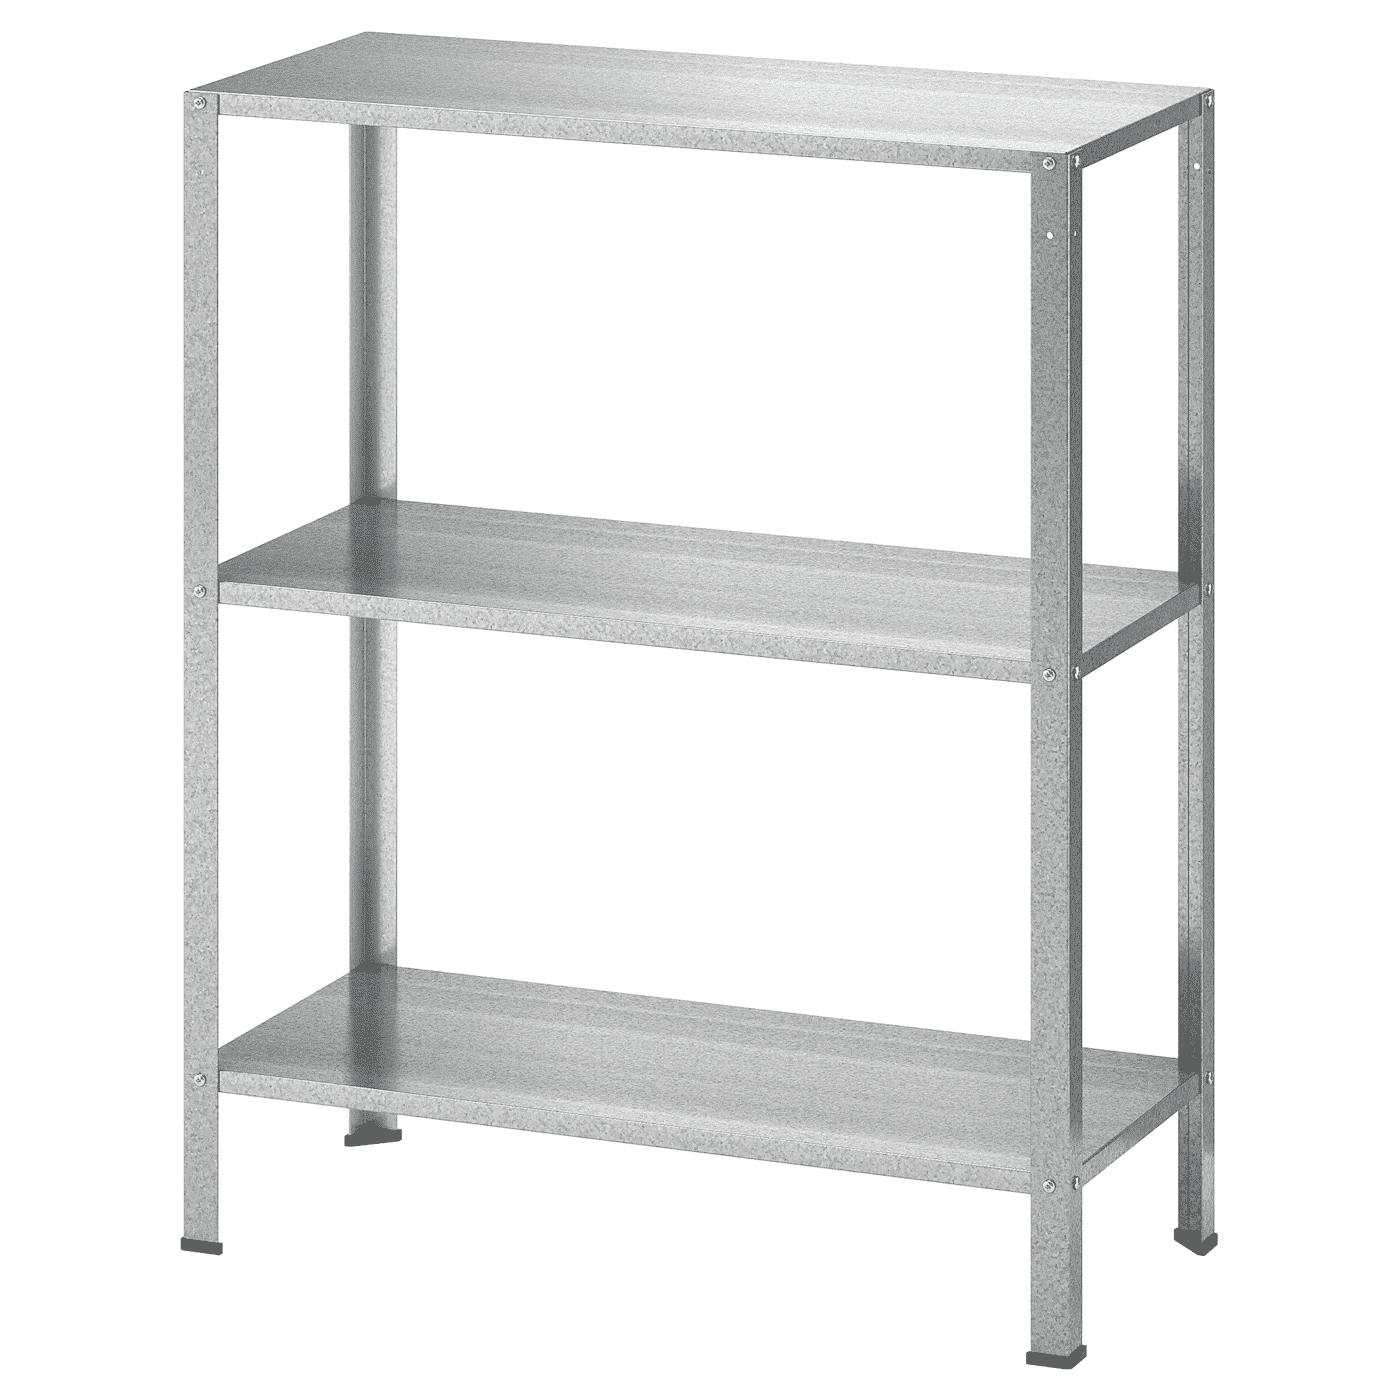 Hyllis Shelf